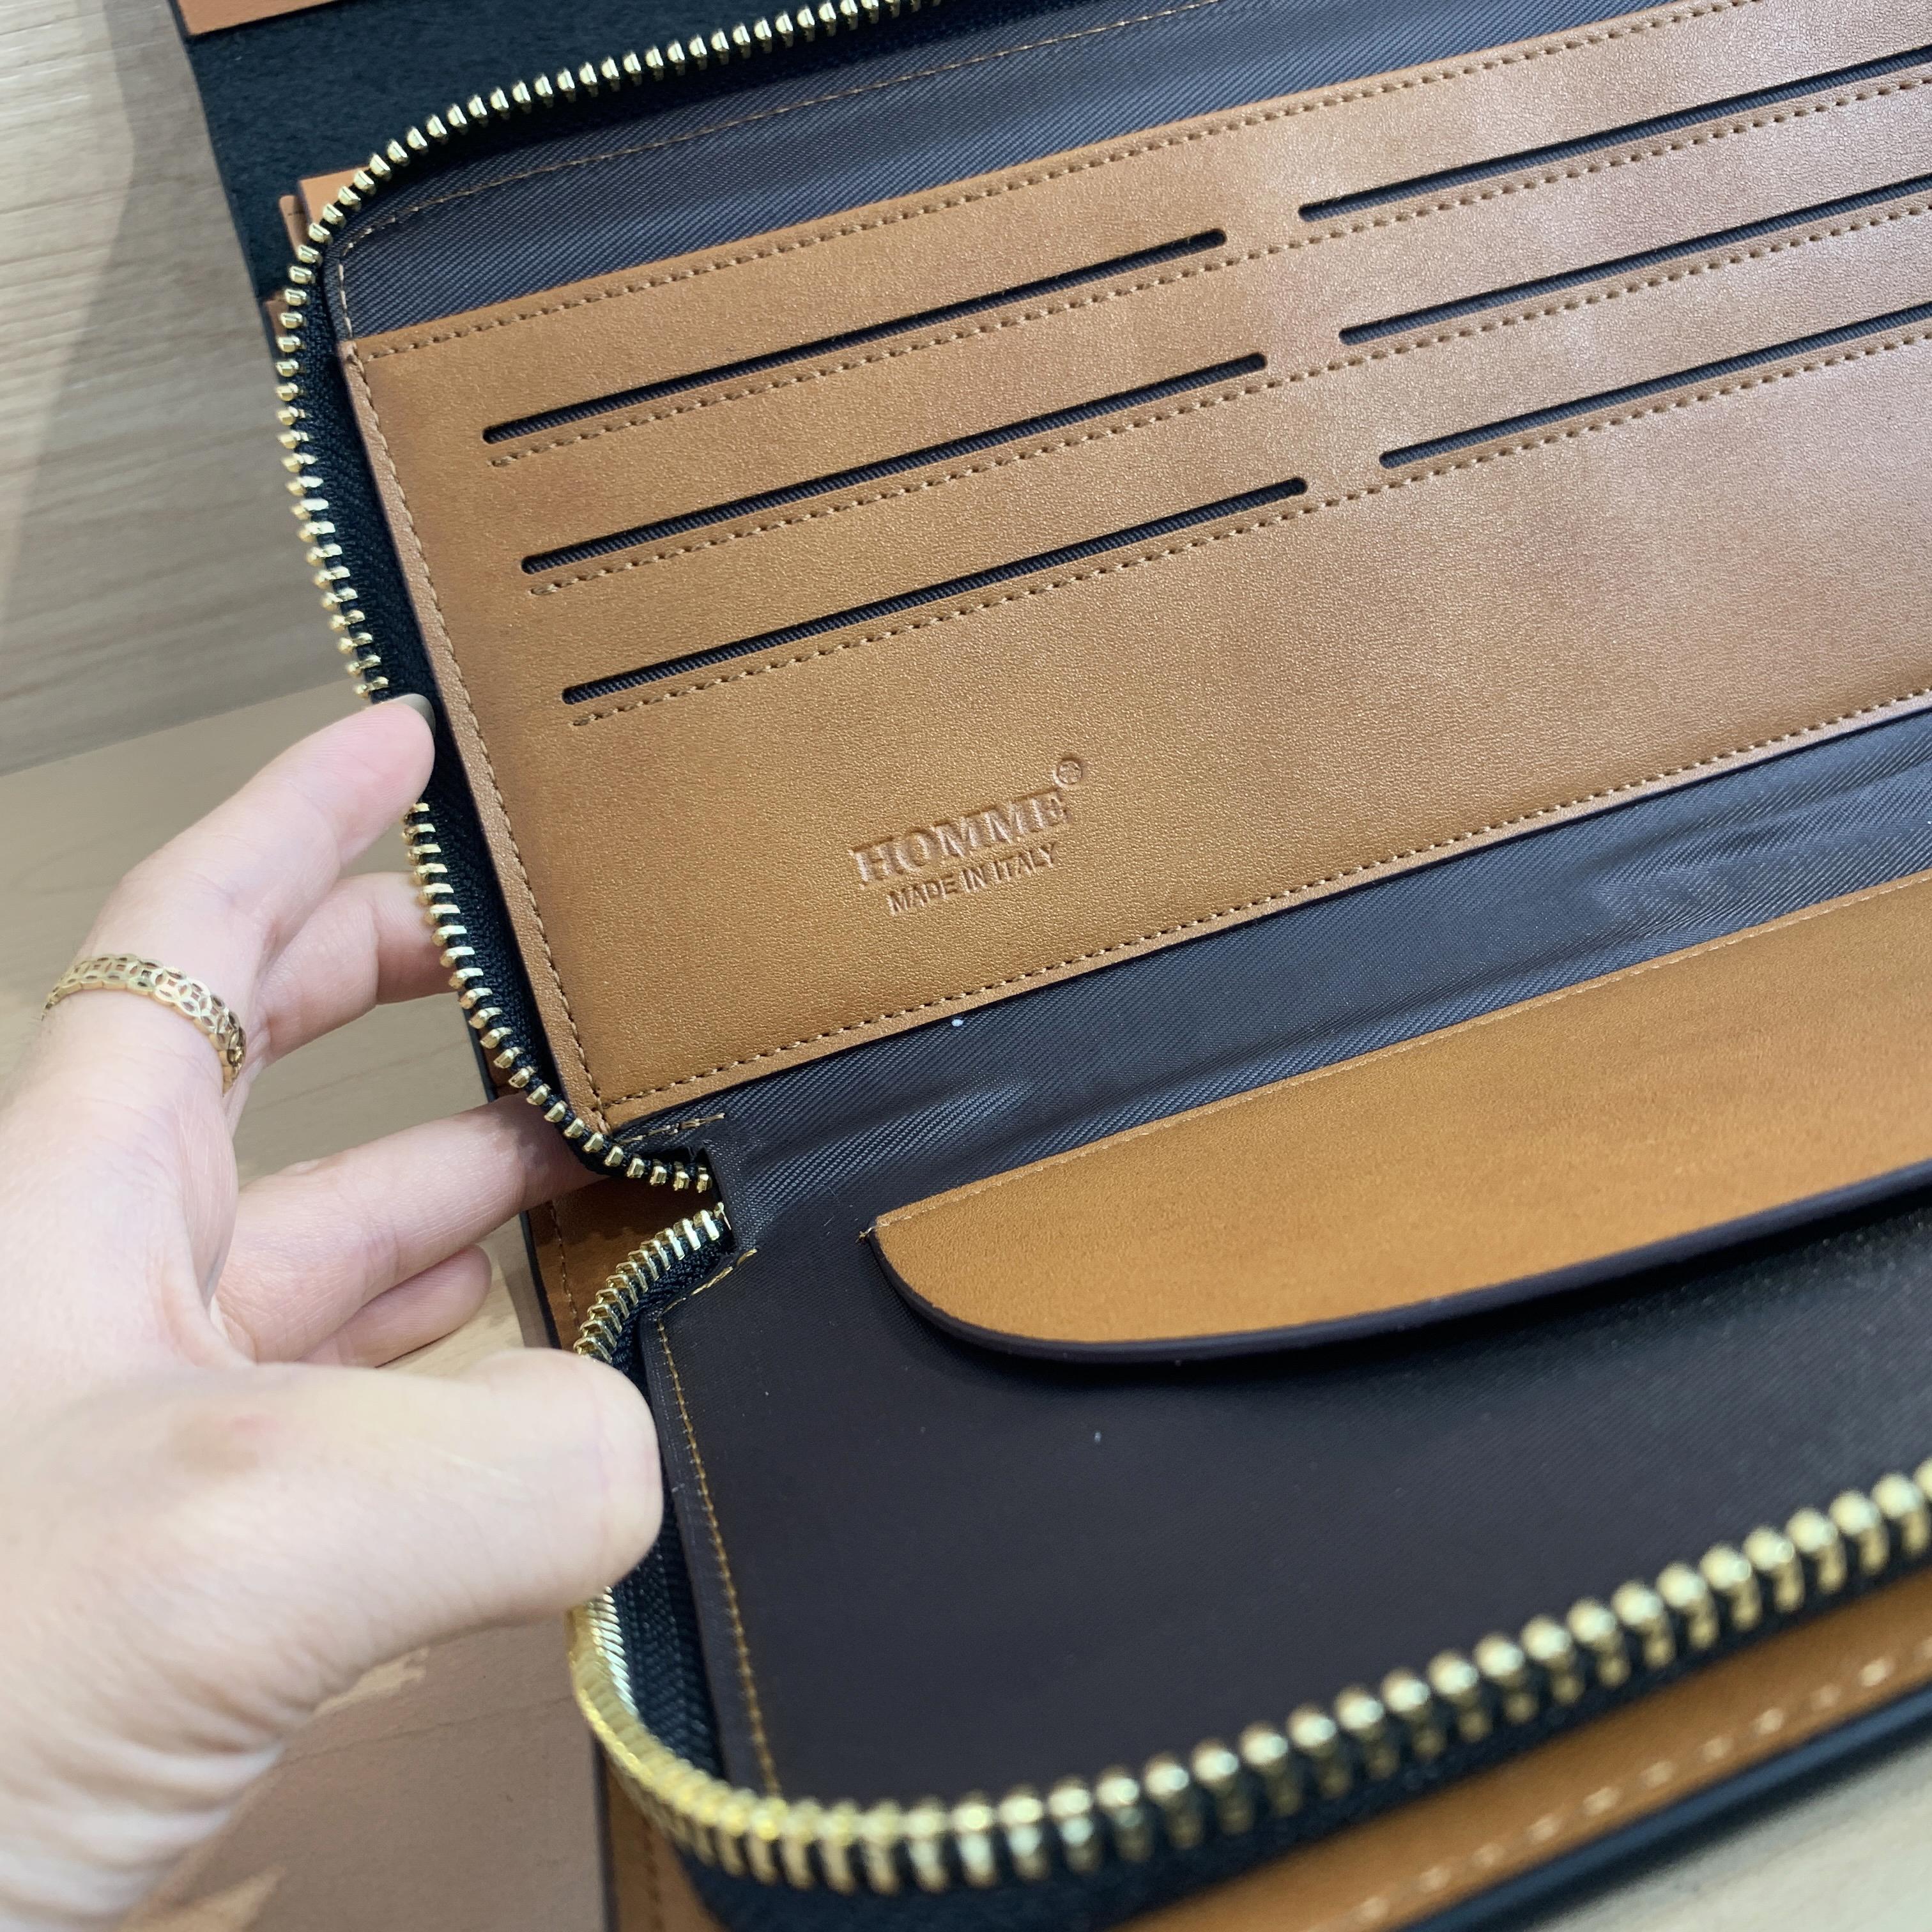 Túi Homme Hamburg - Urban Leather Clutch Bag